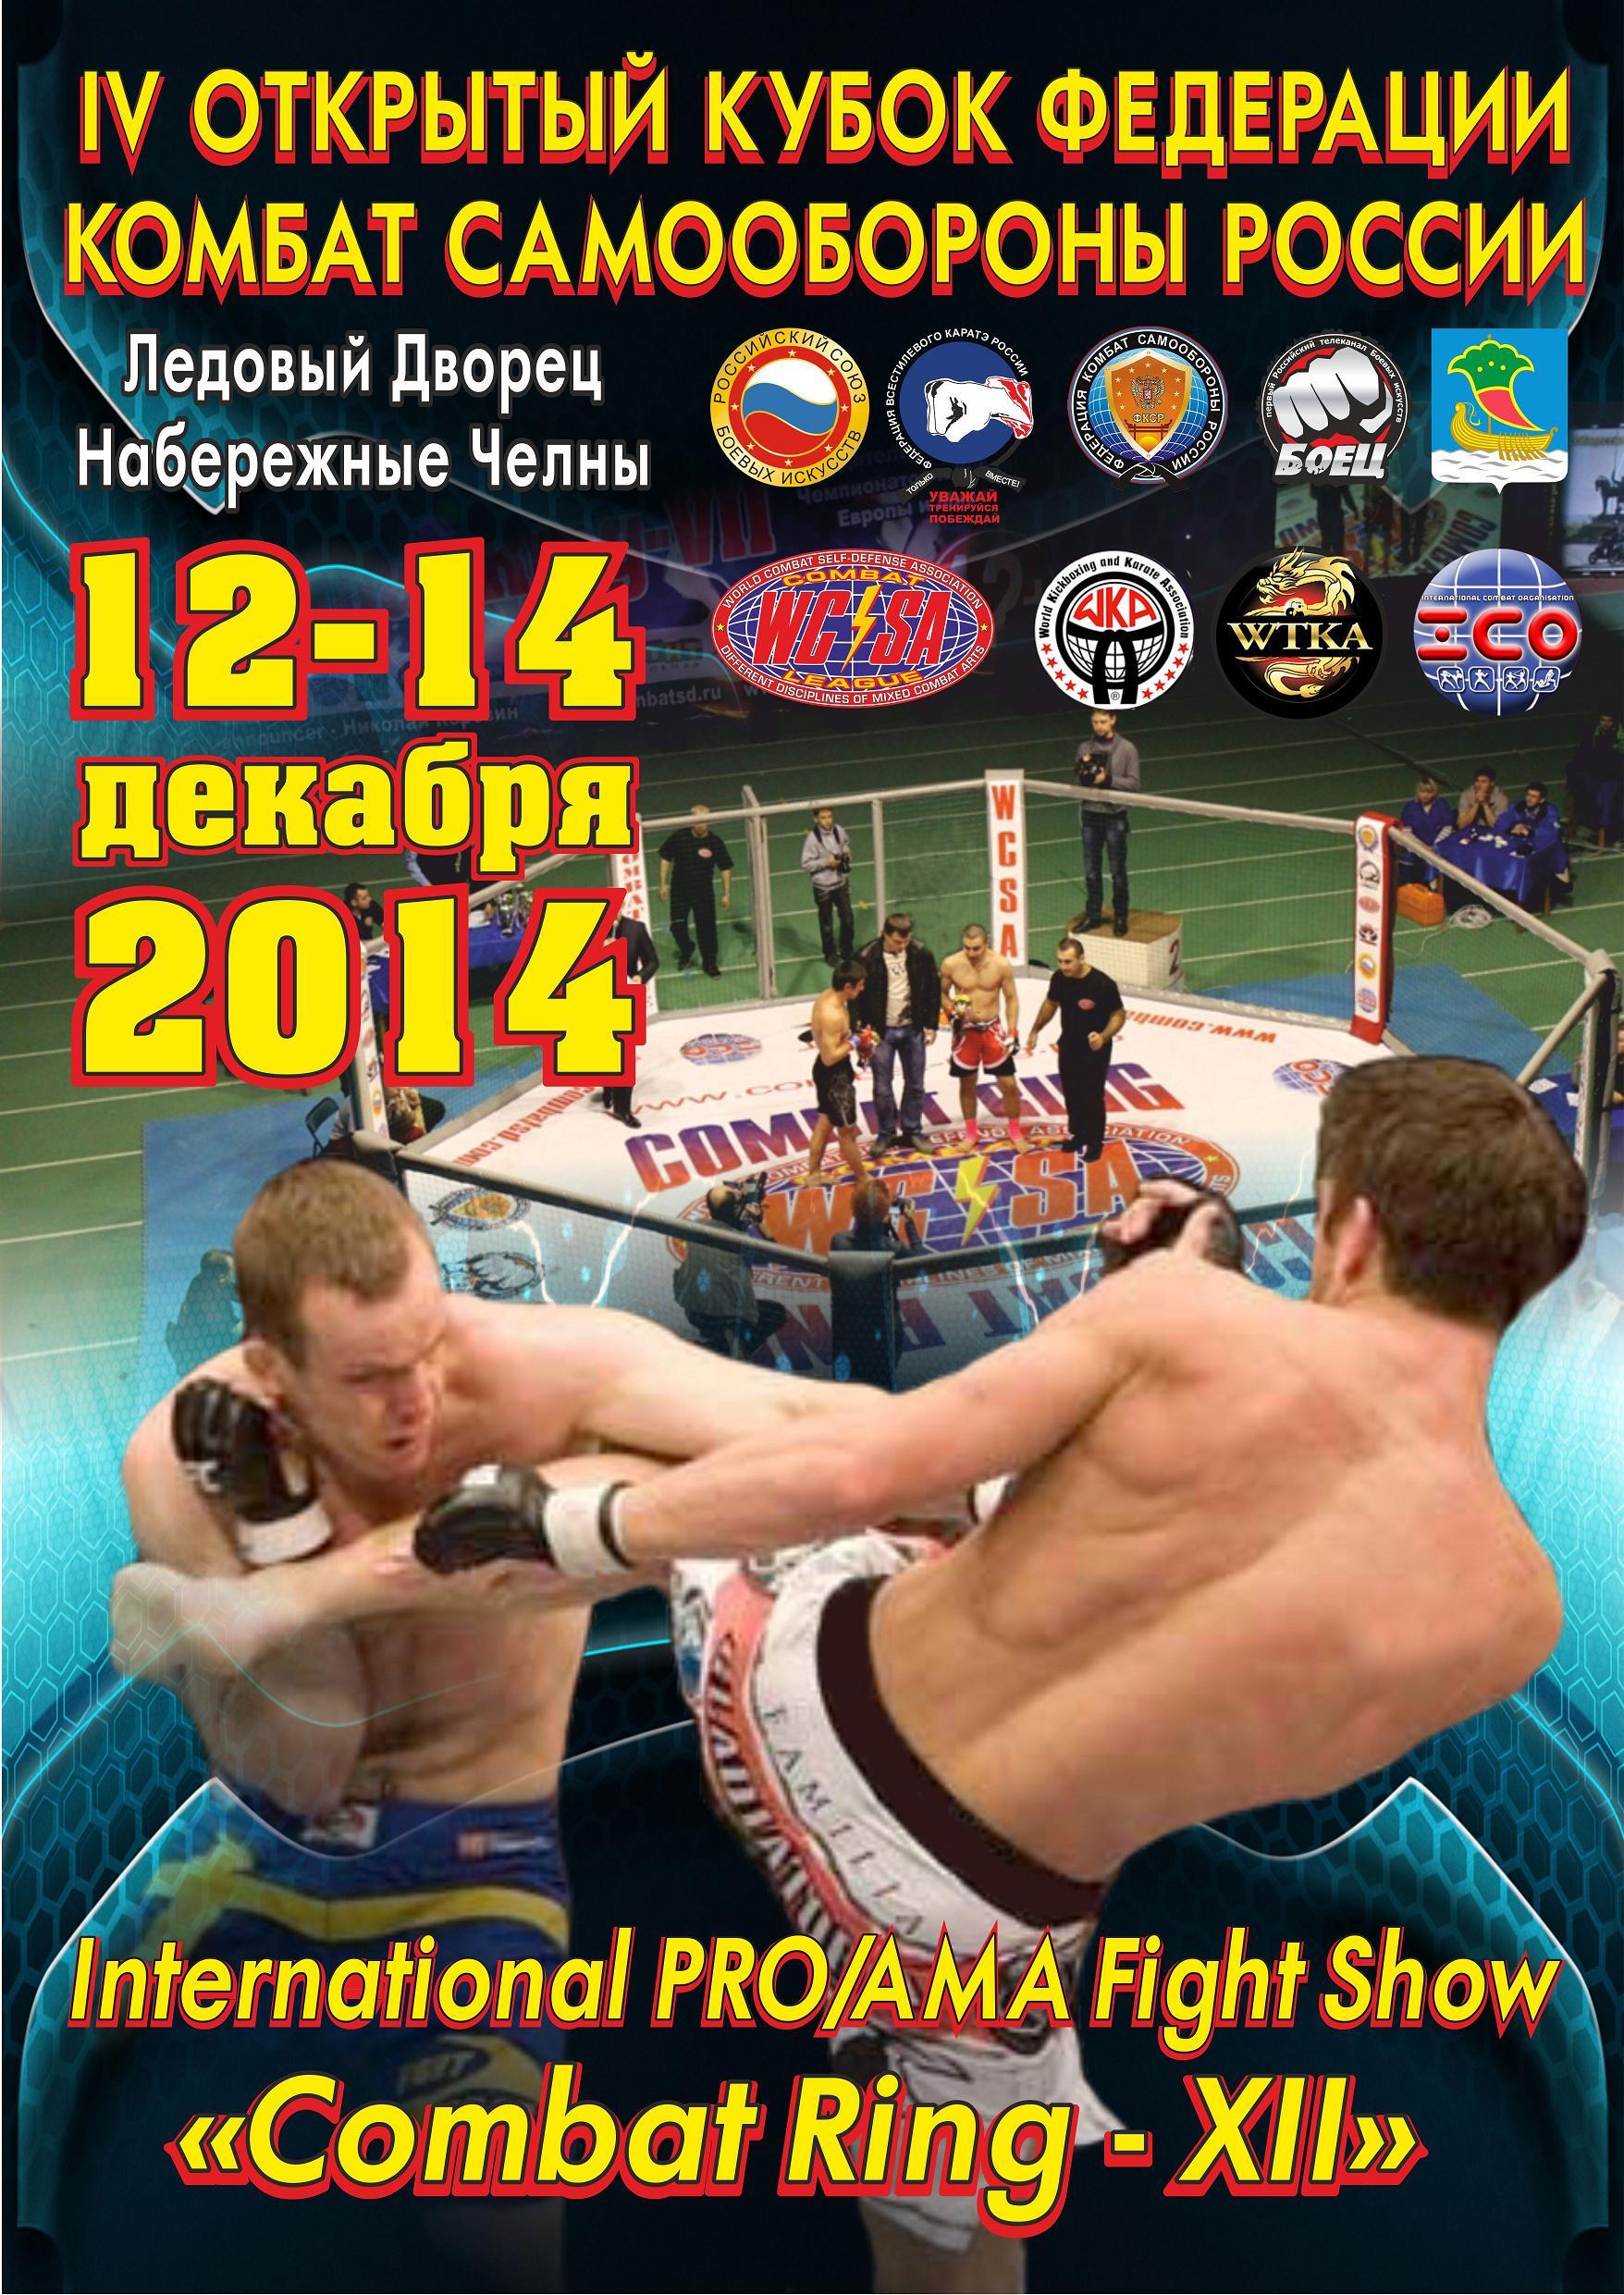 http://www.combatsd.ru/images/upload/Афиша.jpg